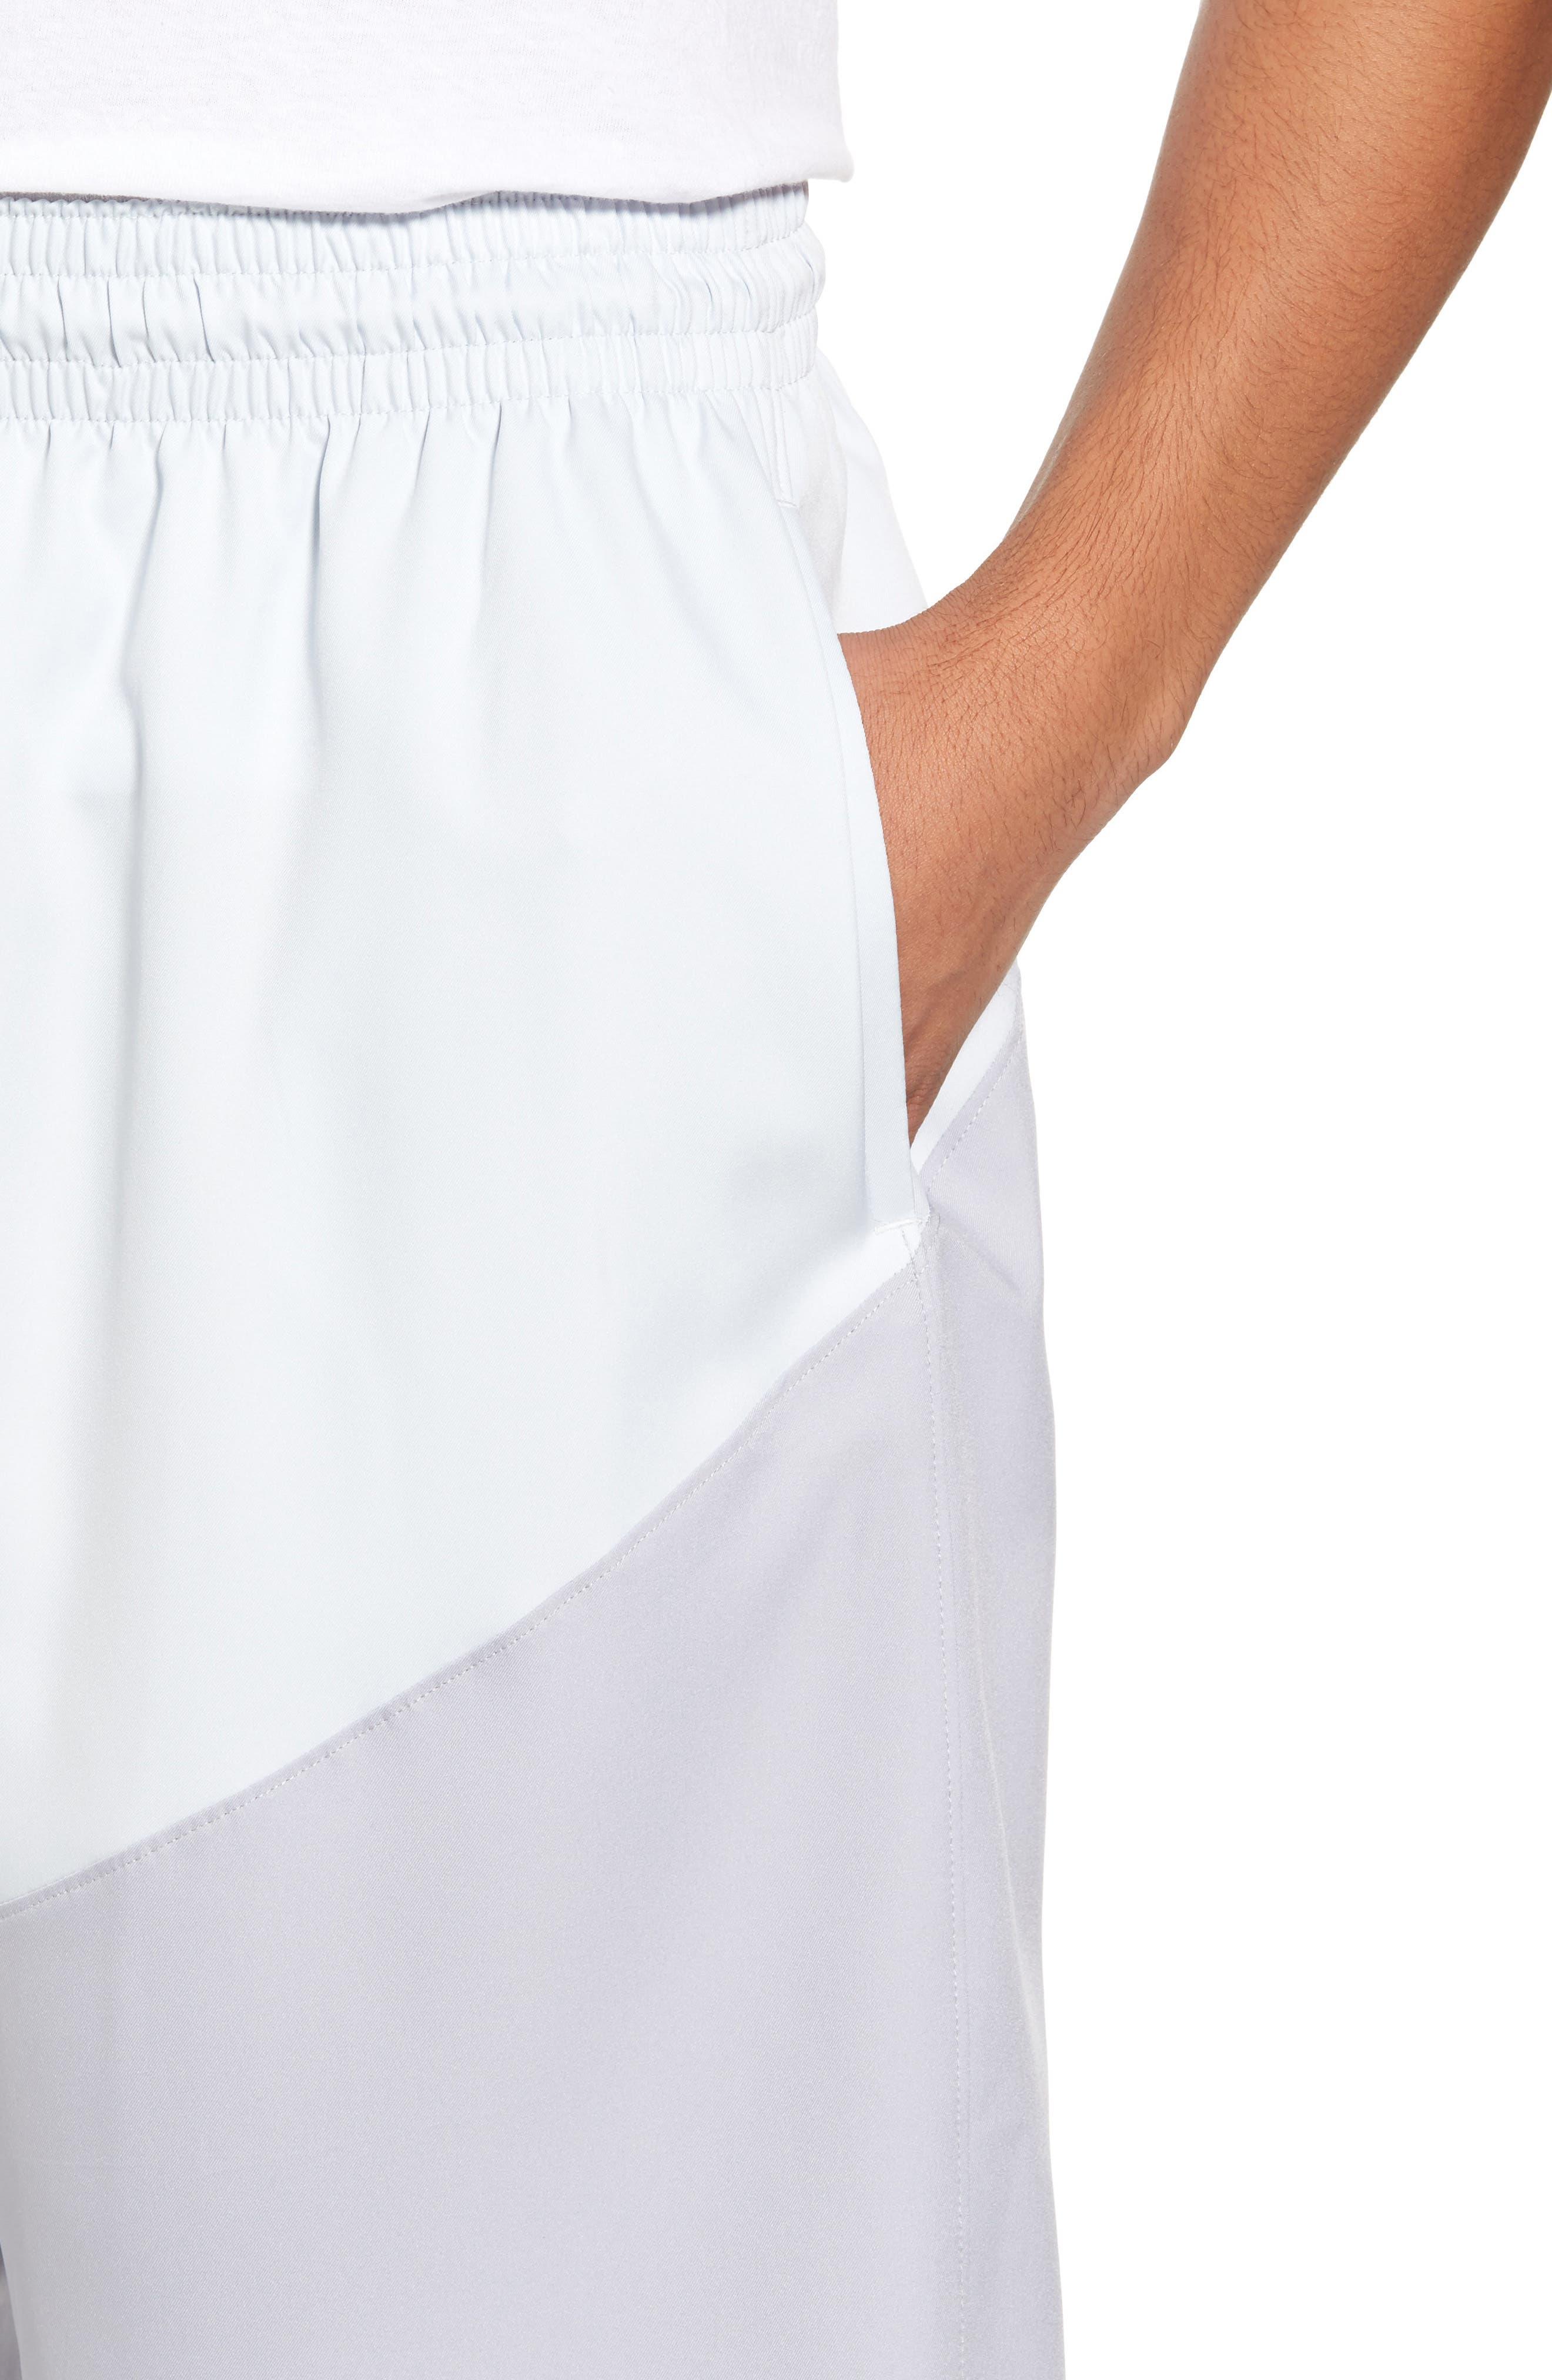 Dry Shorts,                             Alternate thumbnail 4, color,                             027